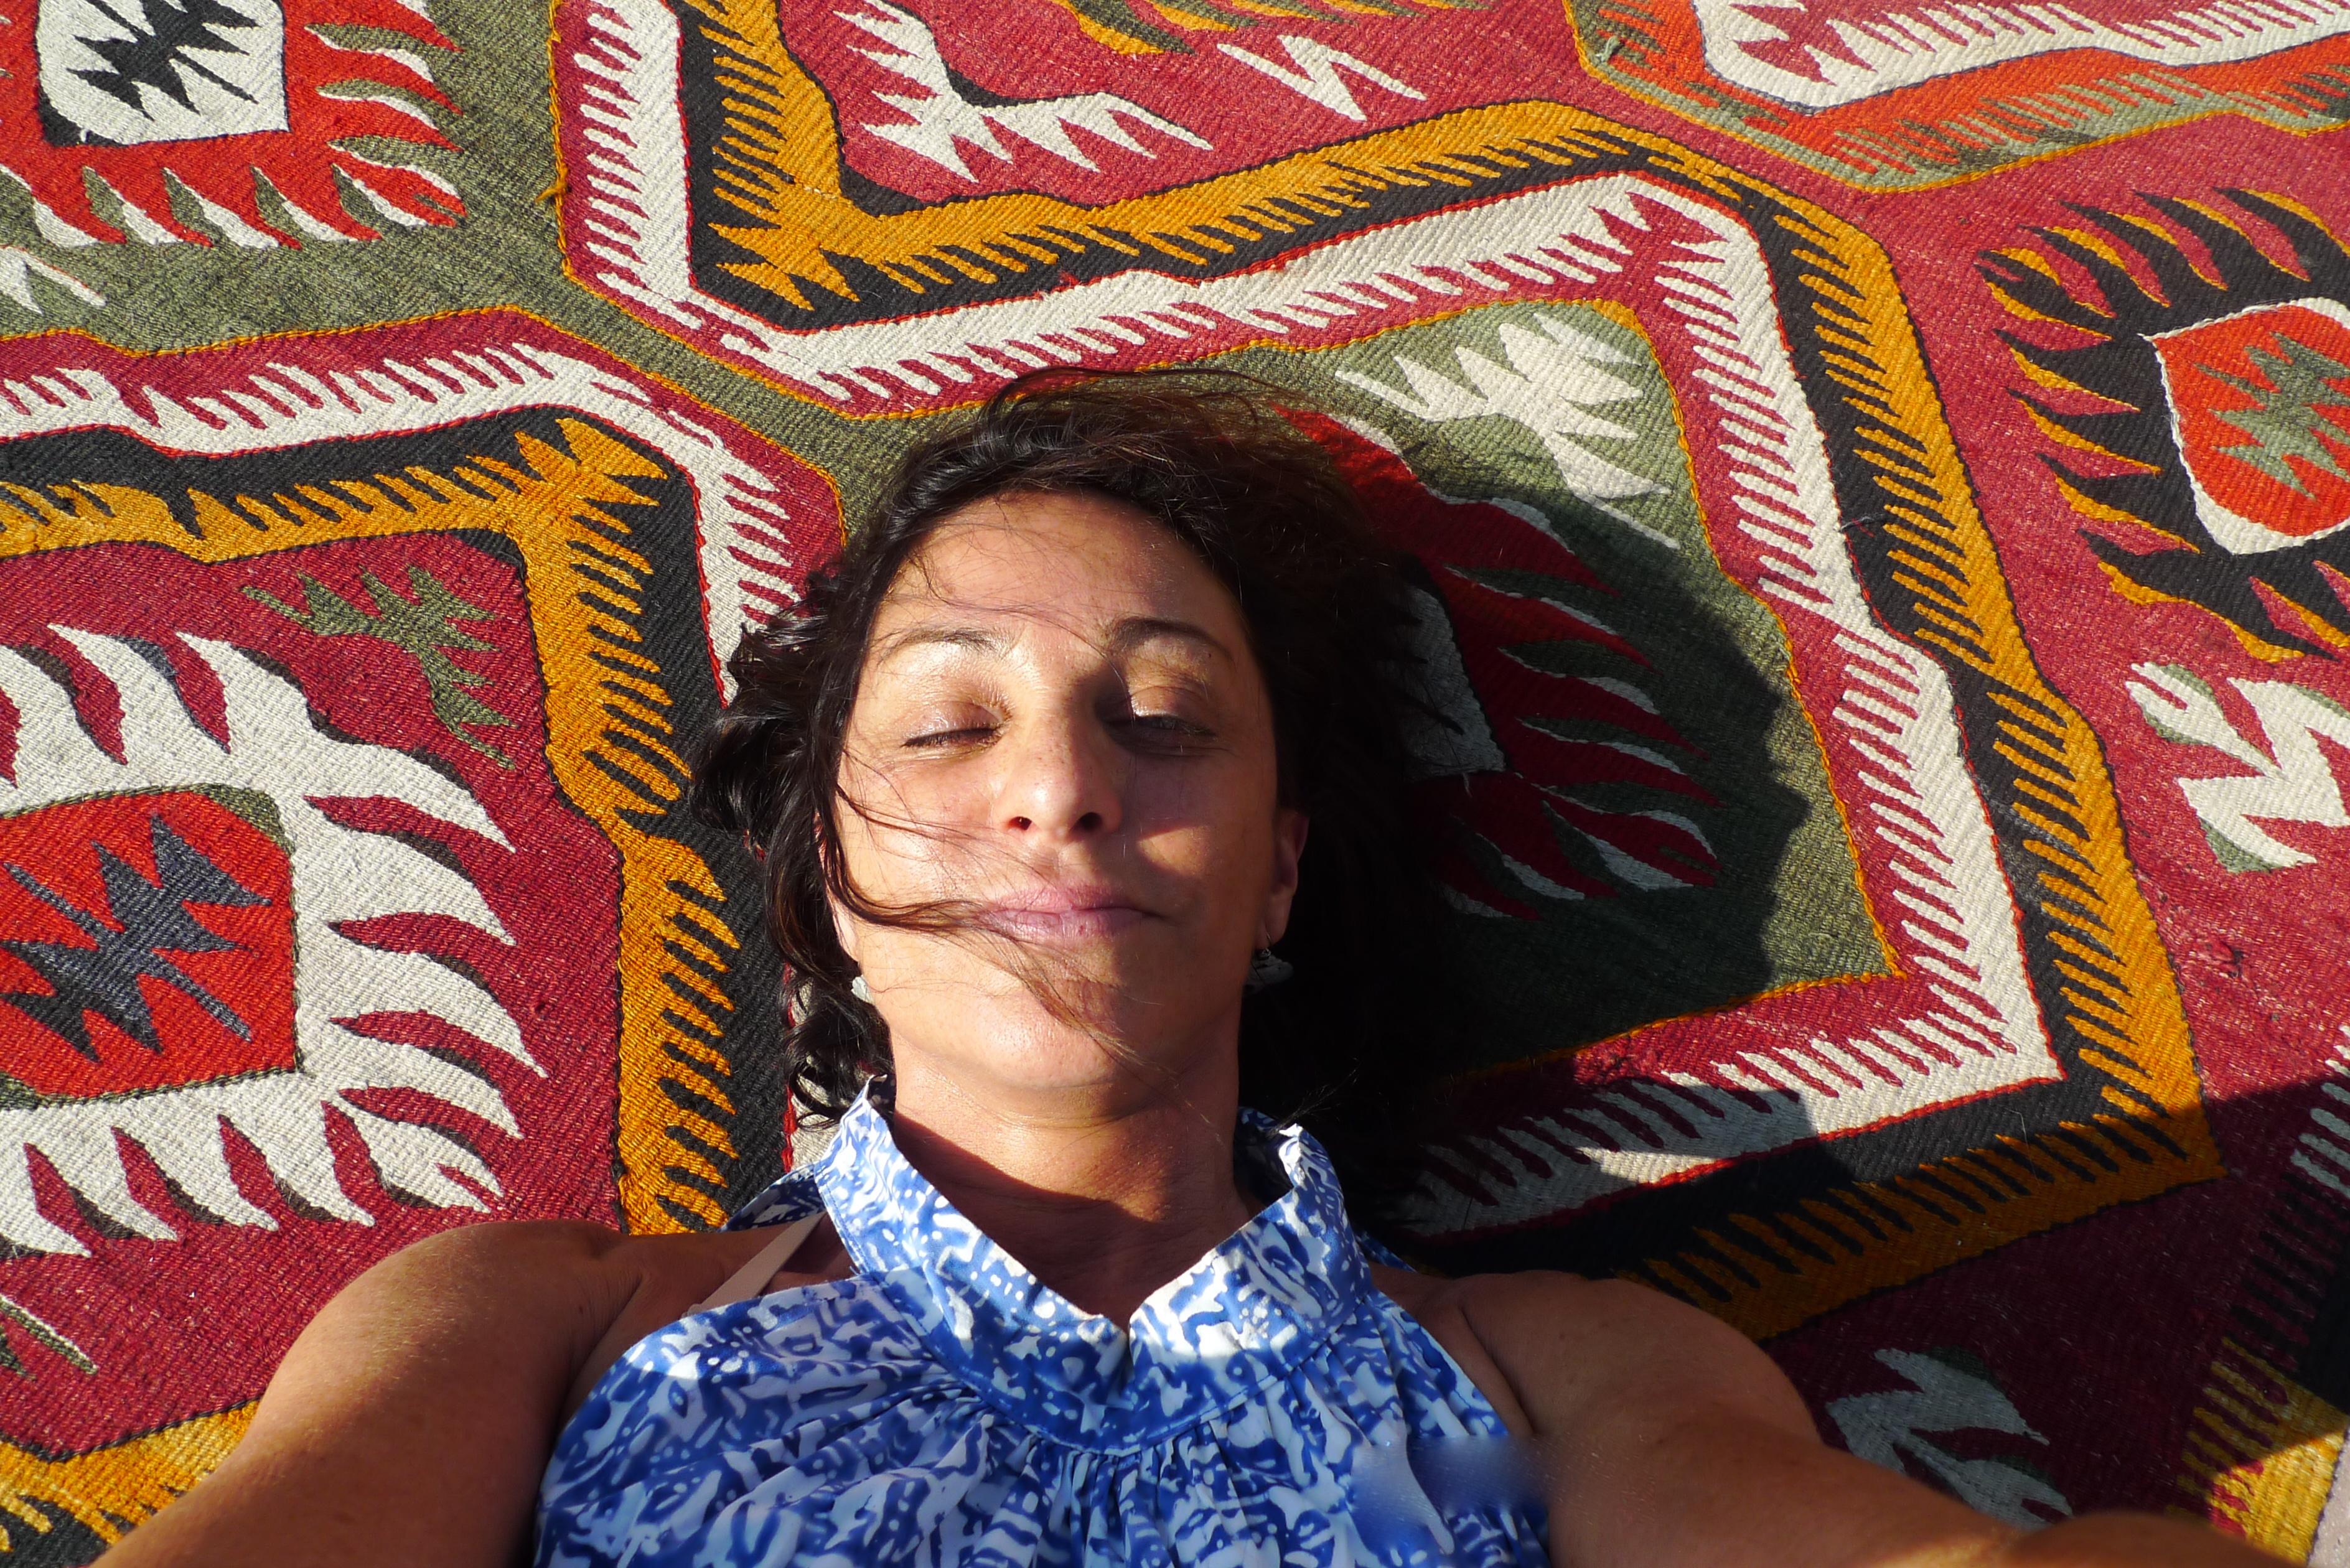 Me on the Turkish rug drug. :)